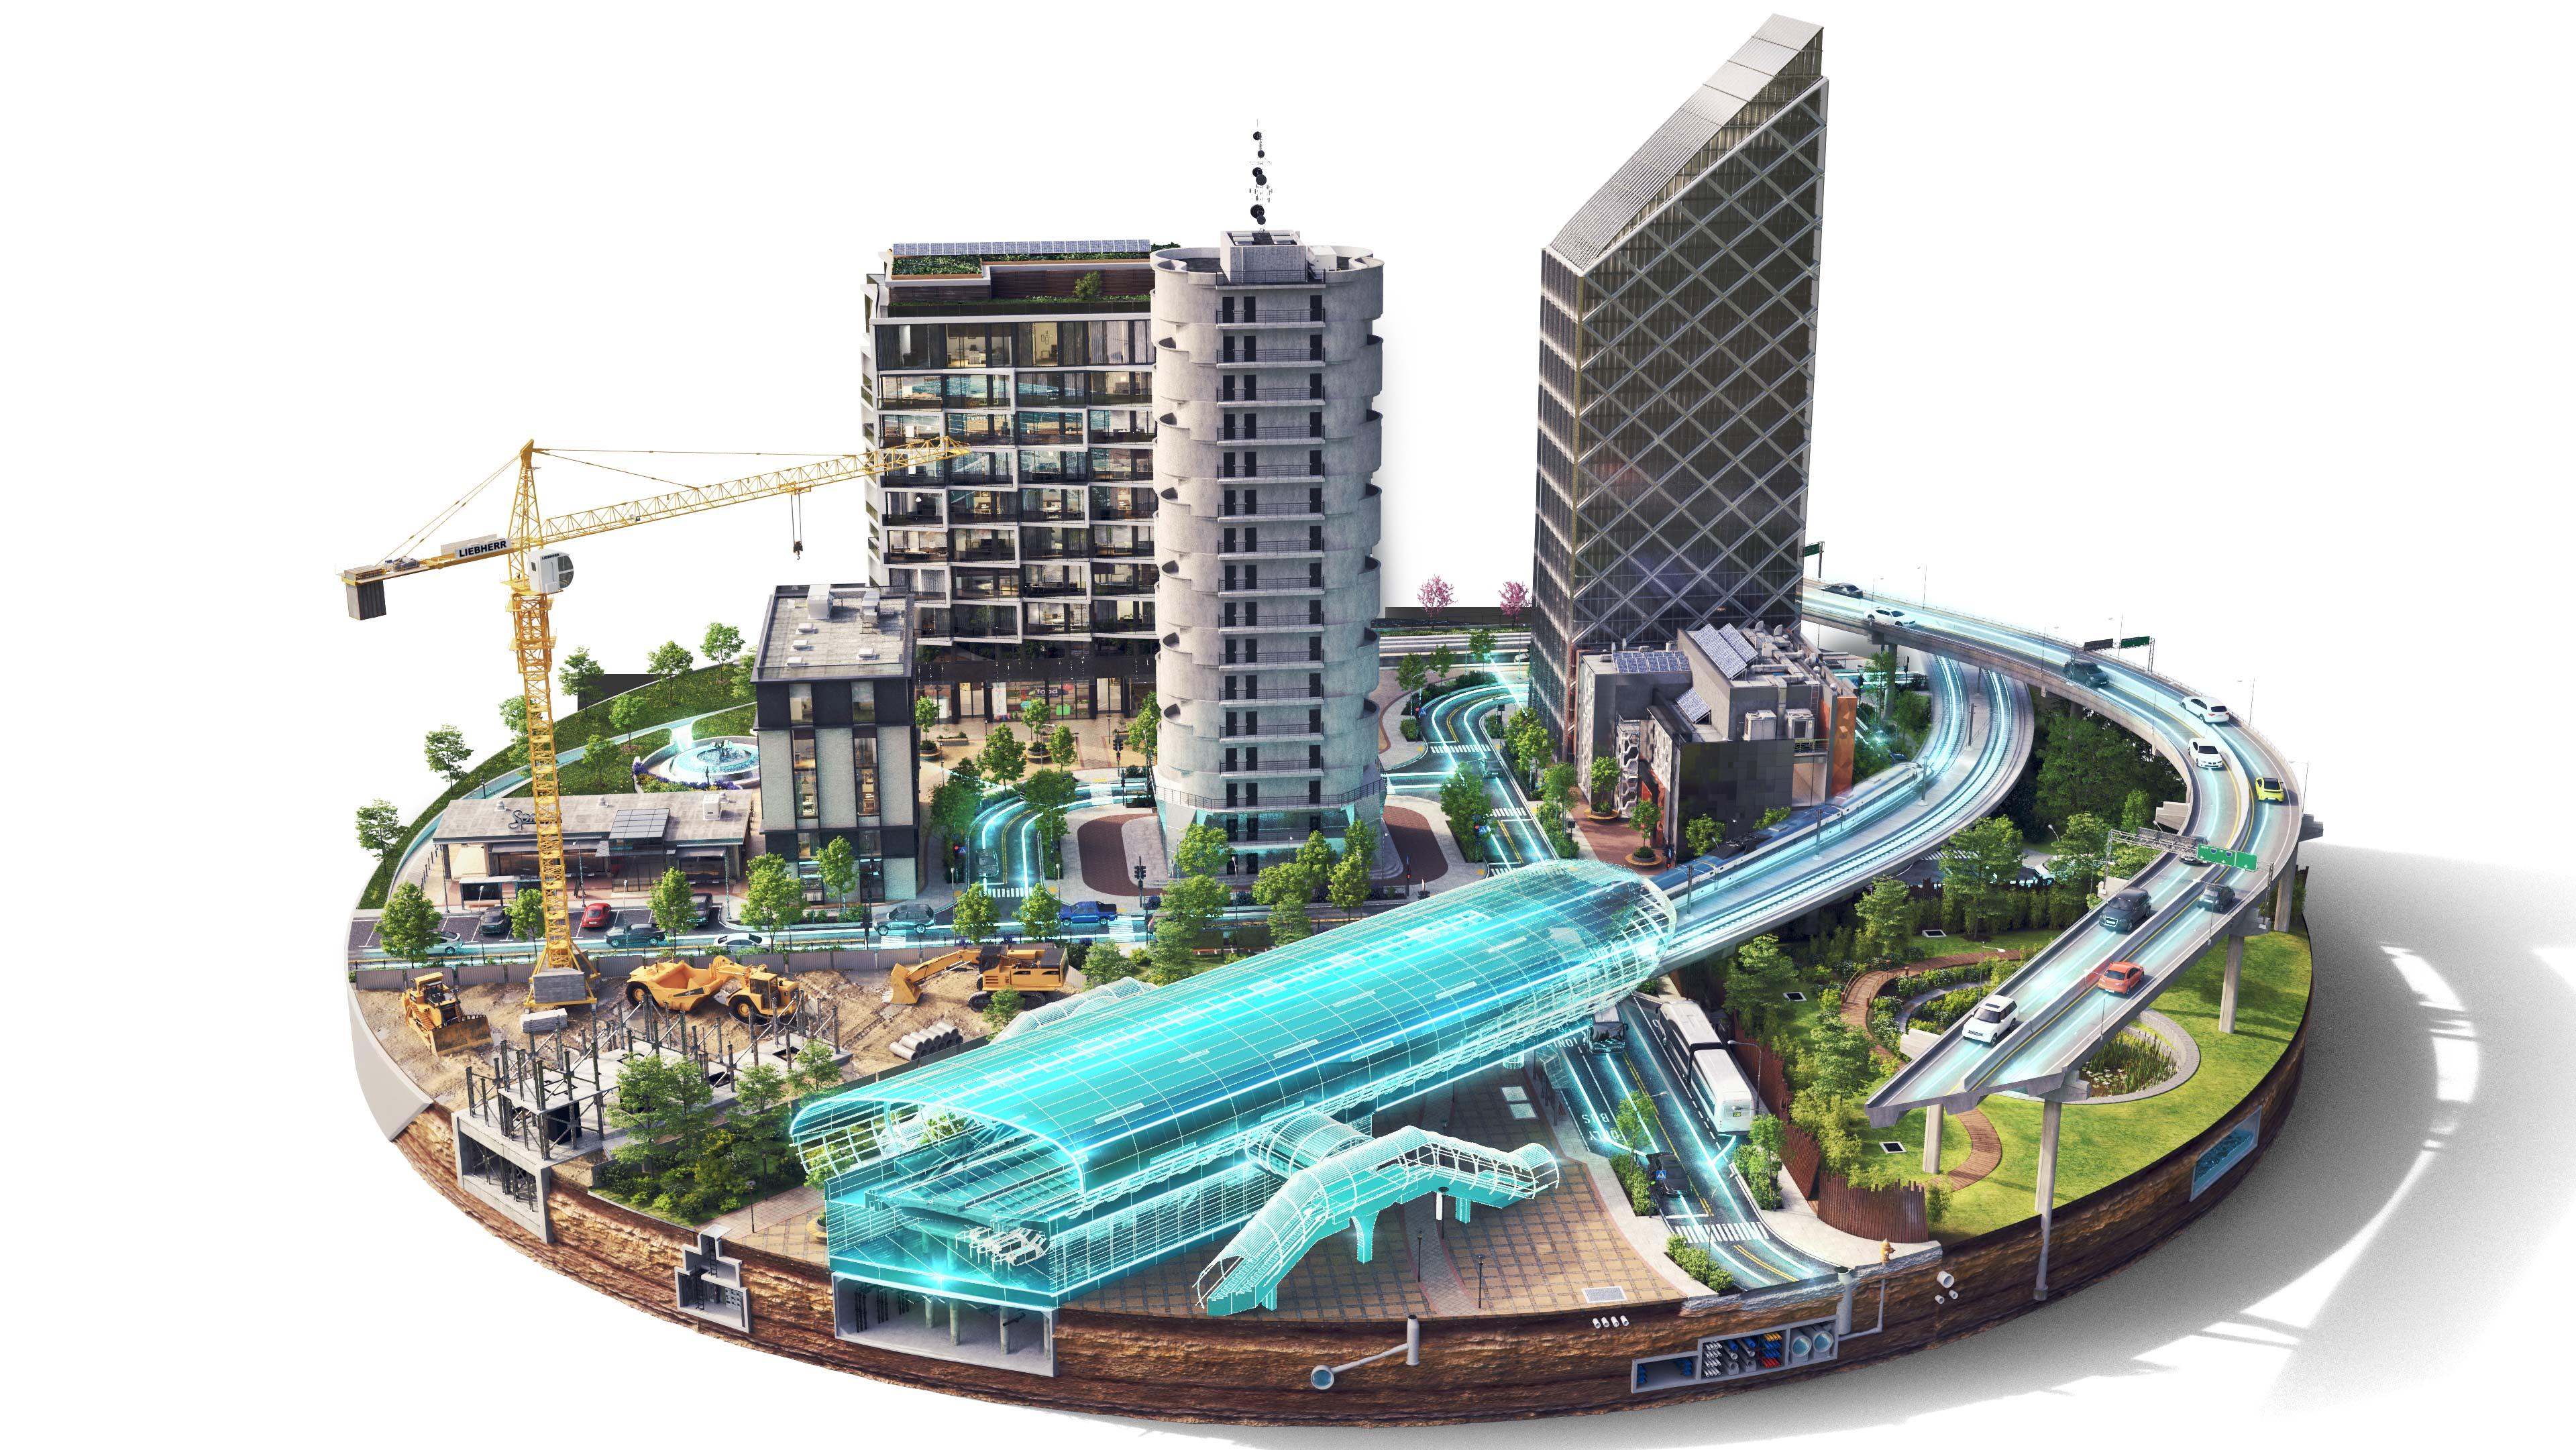 bimcim-infrastructure-operate-digital-twin-image